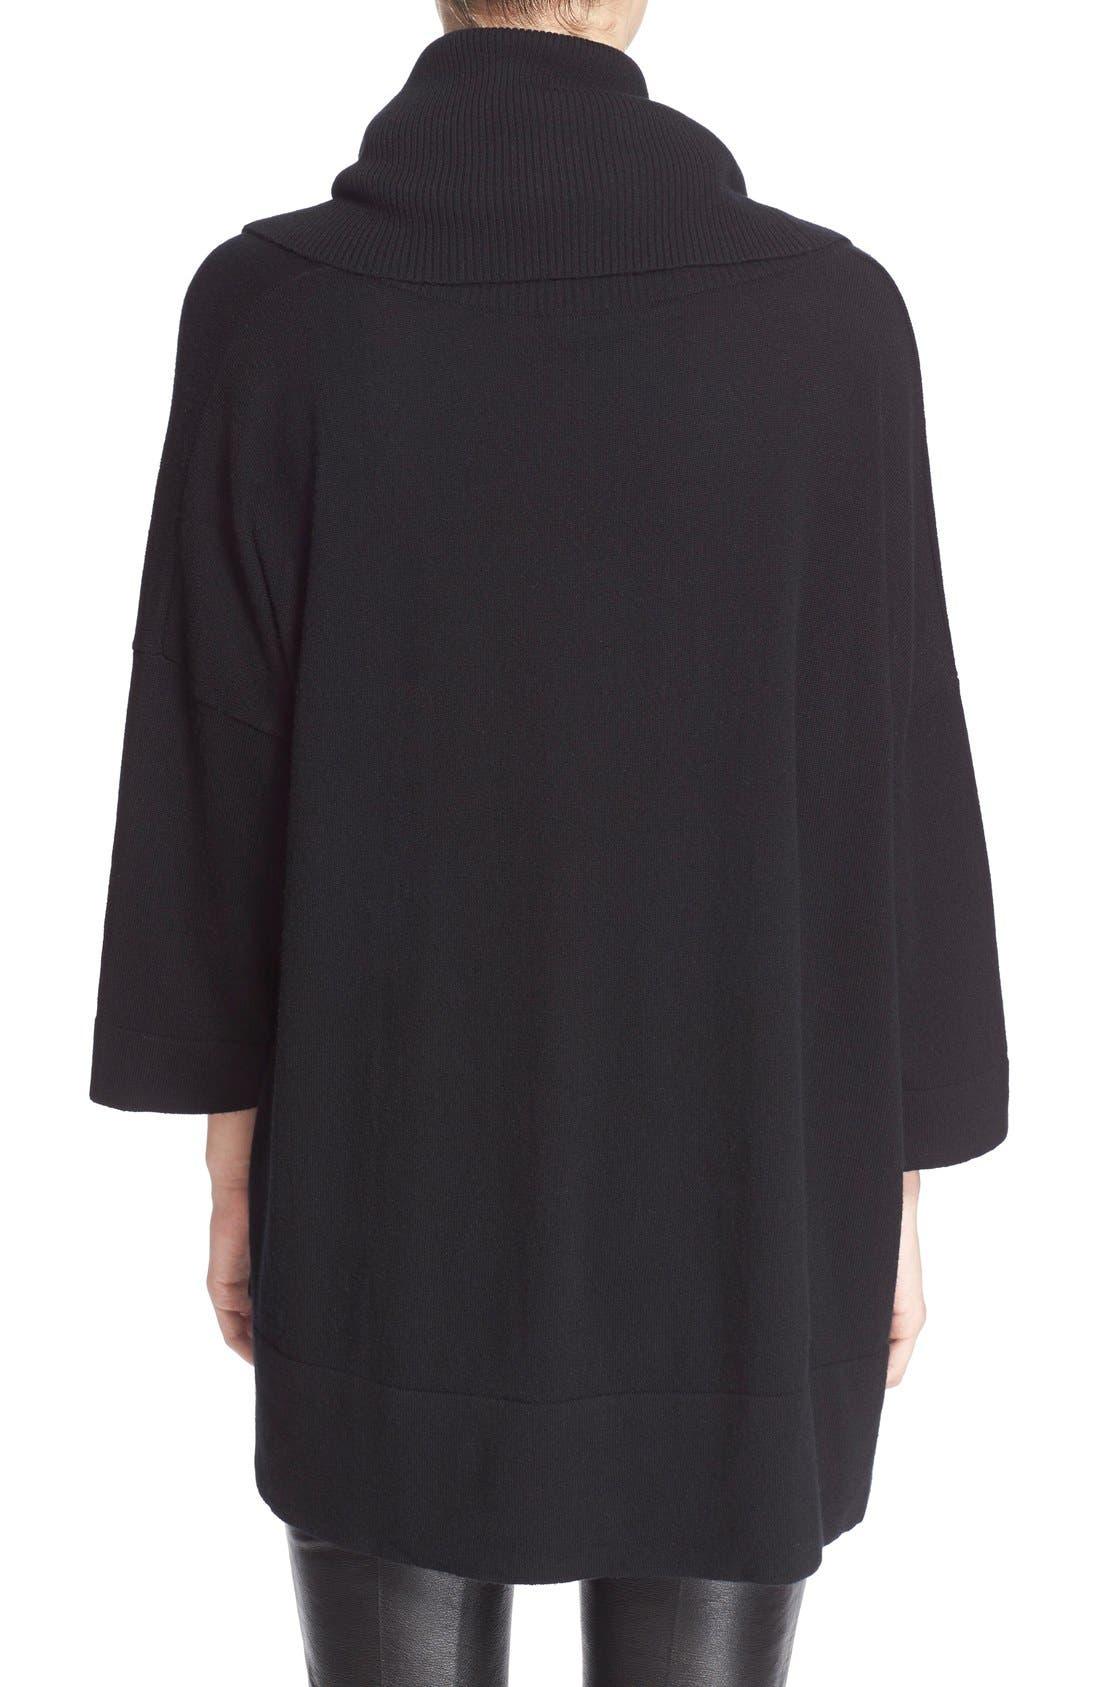 Alternate Image 2  - autumn cashmere Oversized ConvertibleCowl NeckSweater